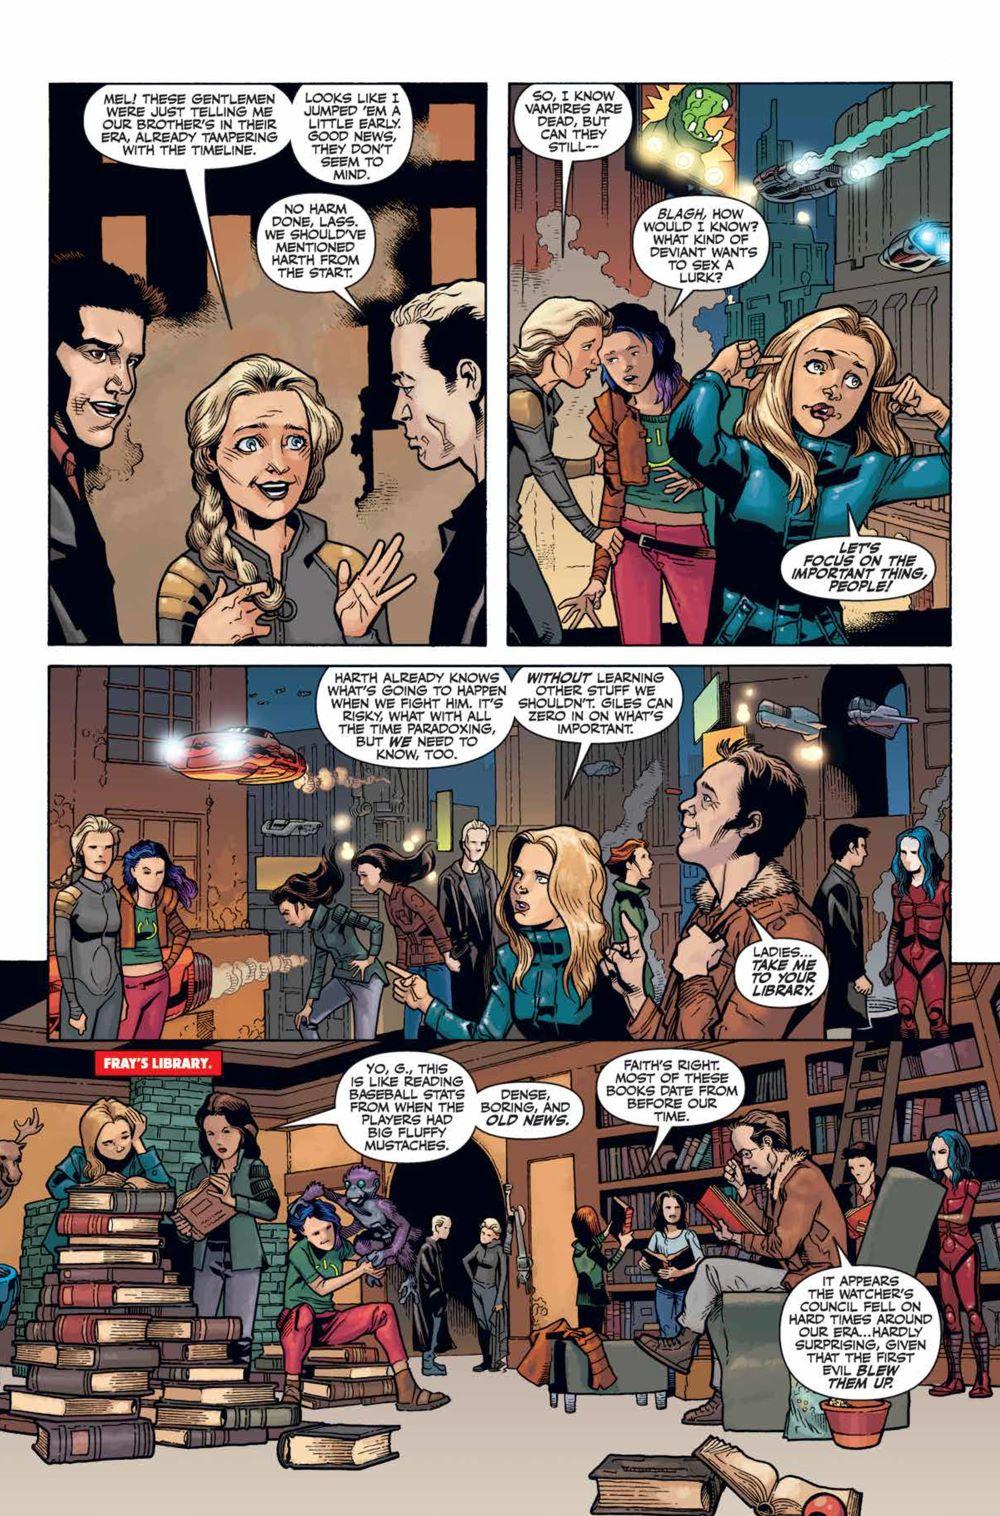 Buffy_Season12_HC_PRESS_139 ComicList Previews: BUFFY THE VAMPIRE SLAYER SEASON 12 LIBRARY EDITION VOLUME 1 HC